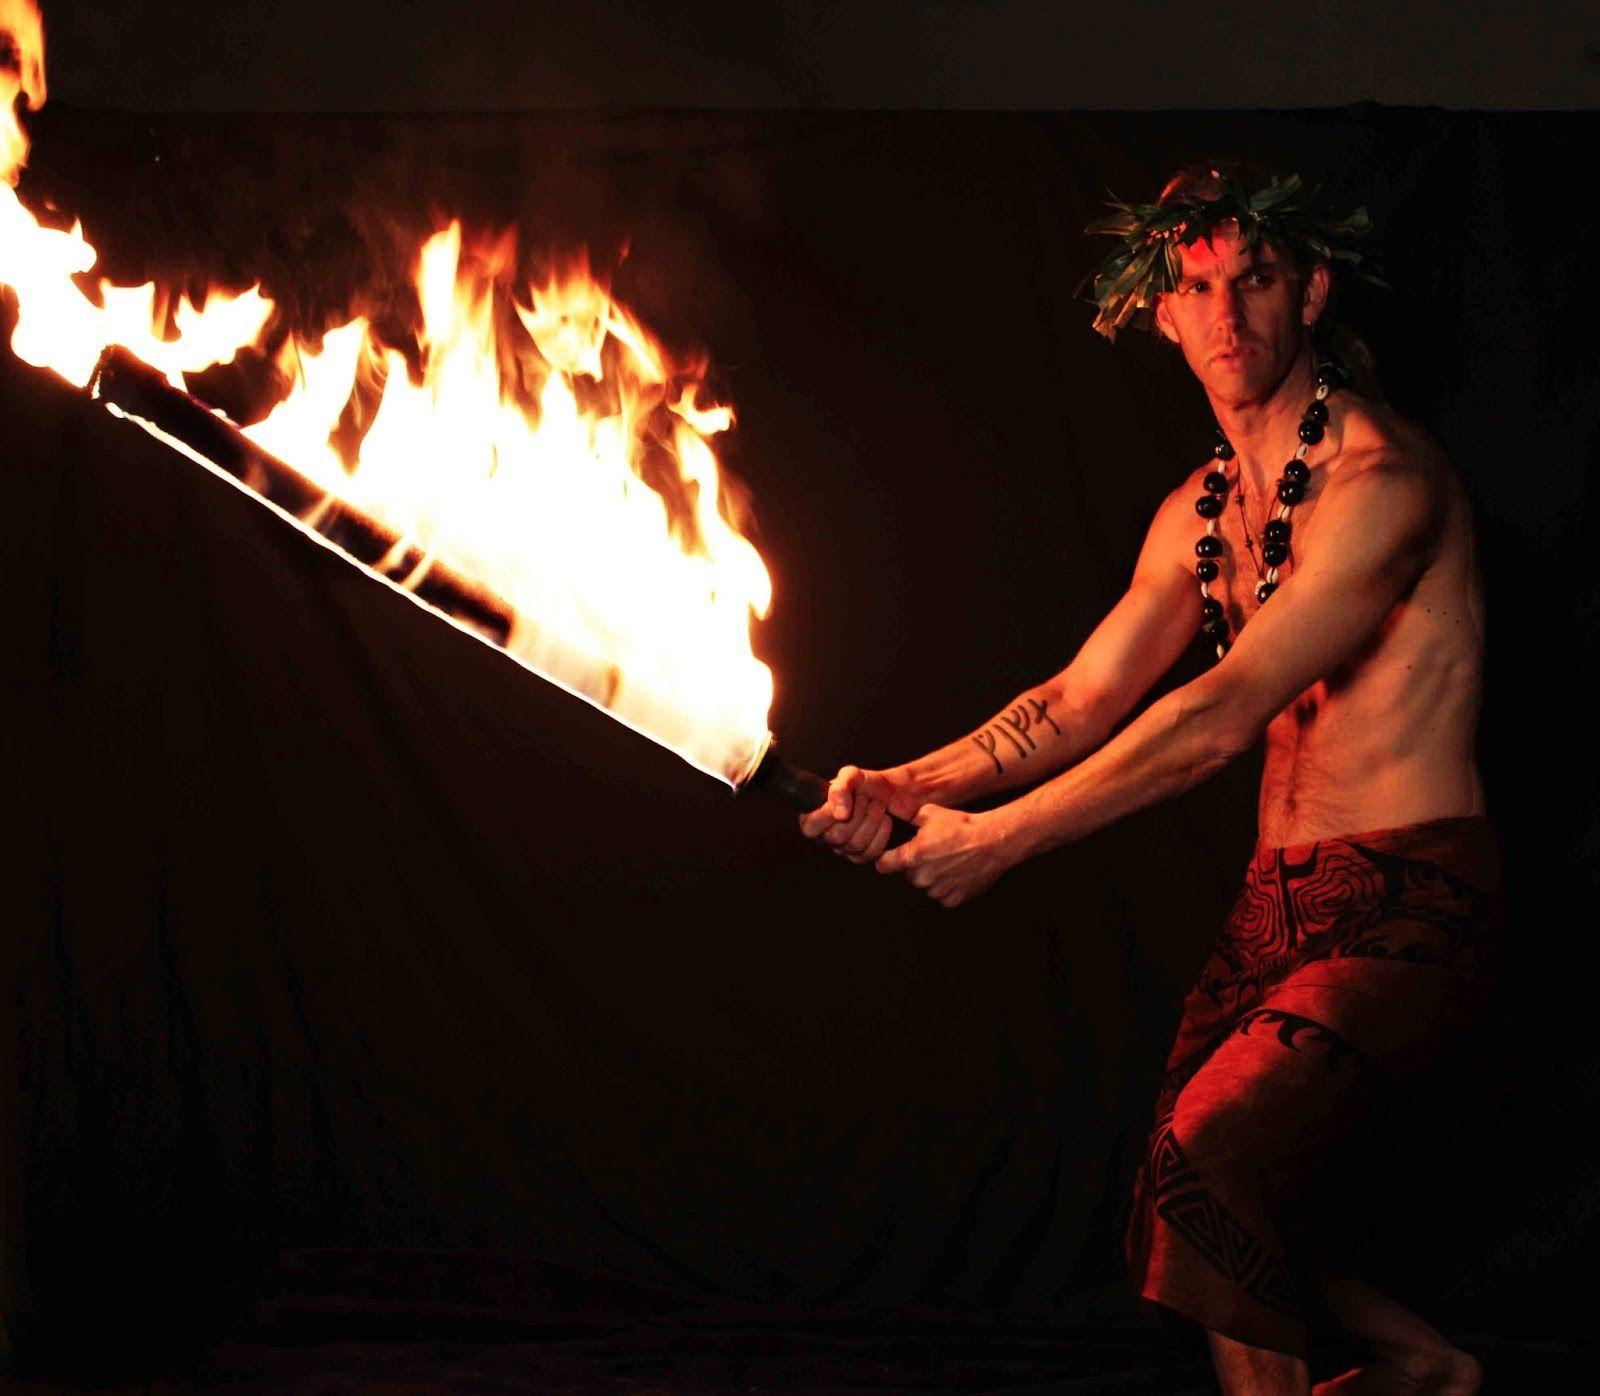 Samoan Fire Sword Fire Dancer Samoanfire Mantrest